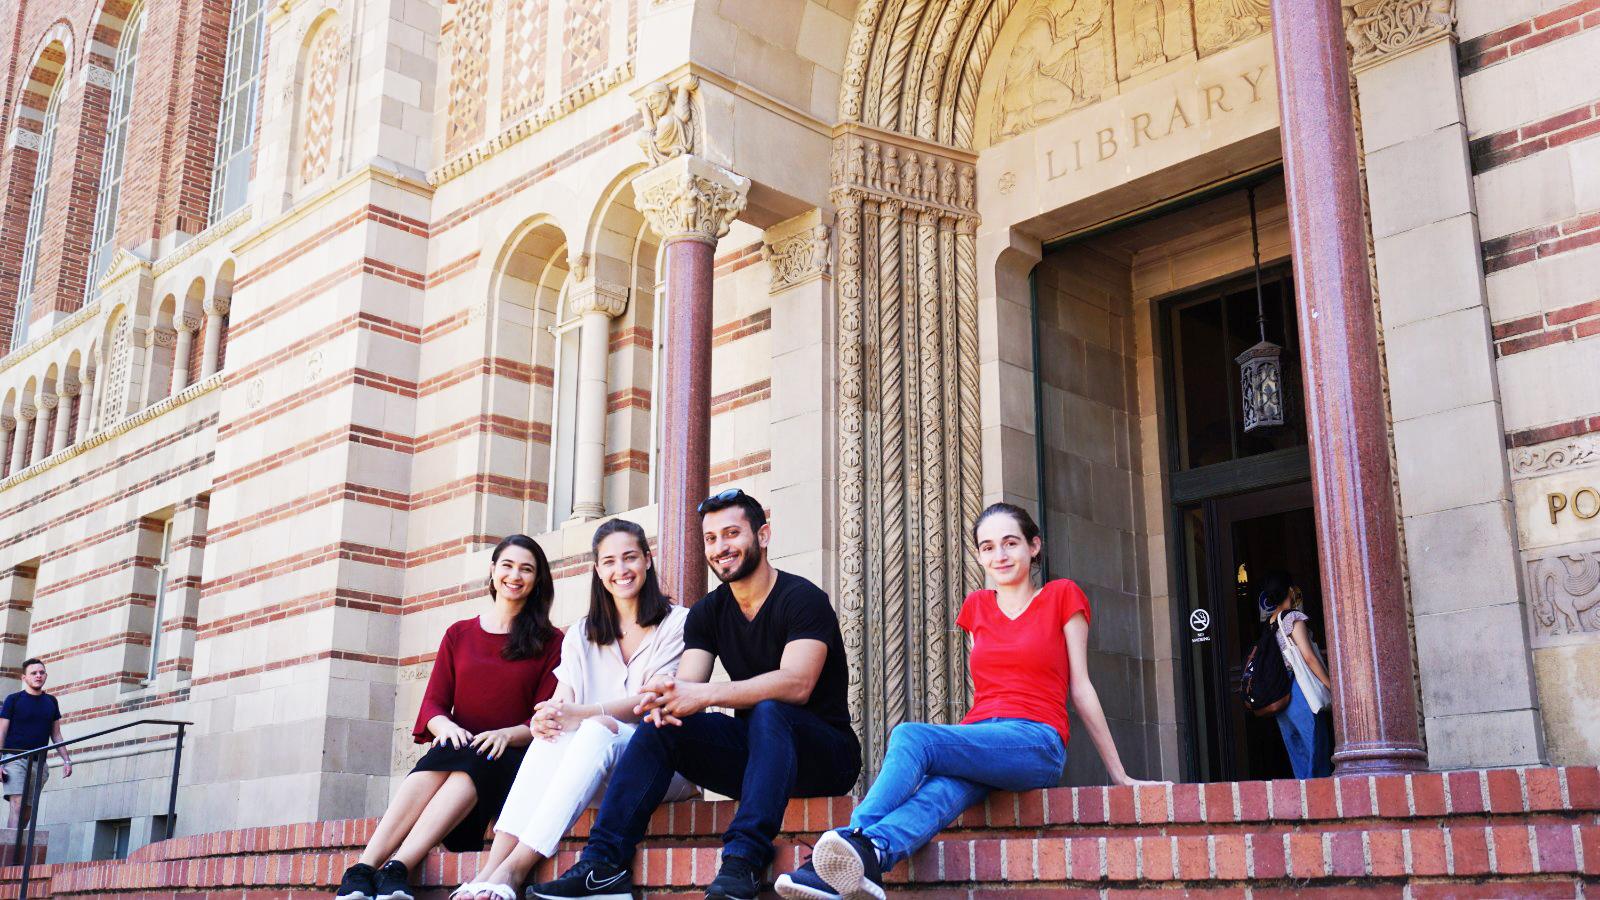 UCLA/Tel Aviv University Student Exchange Program